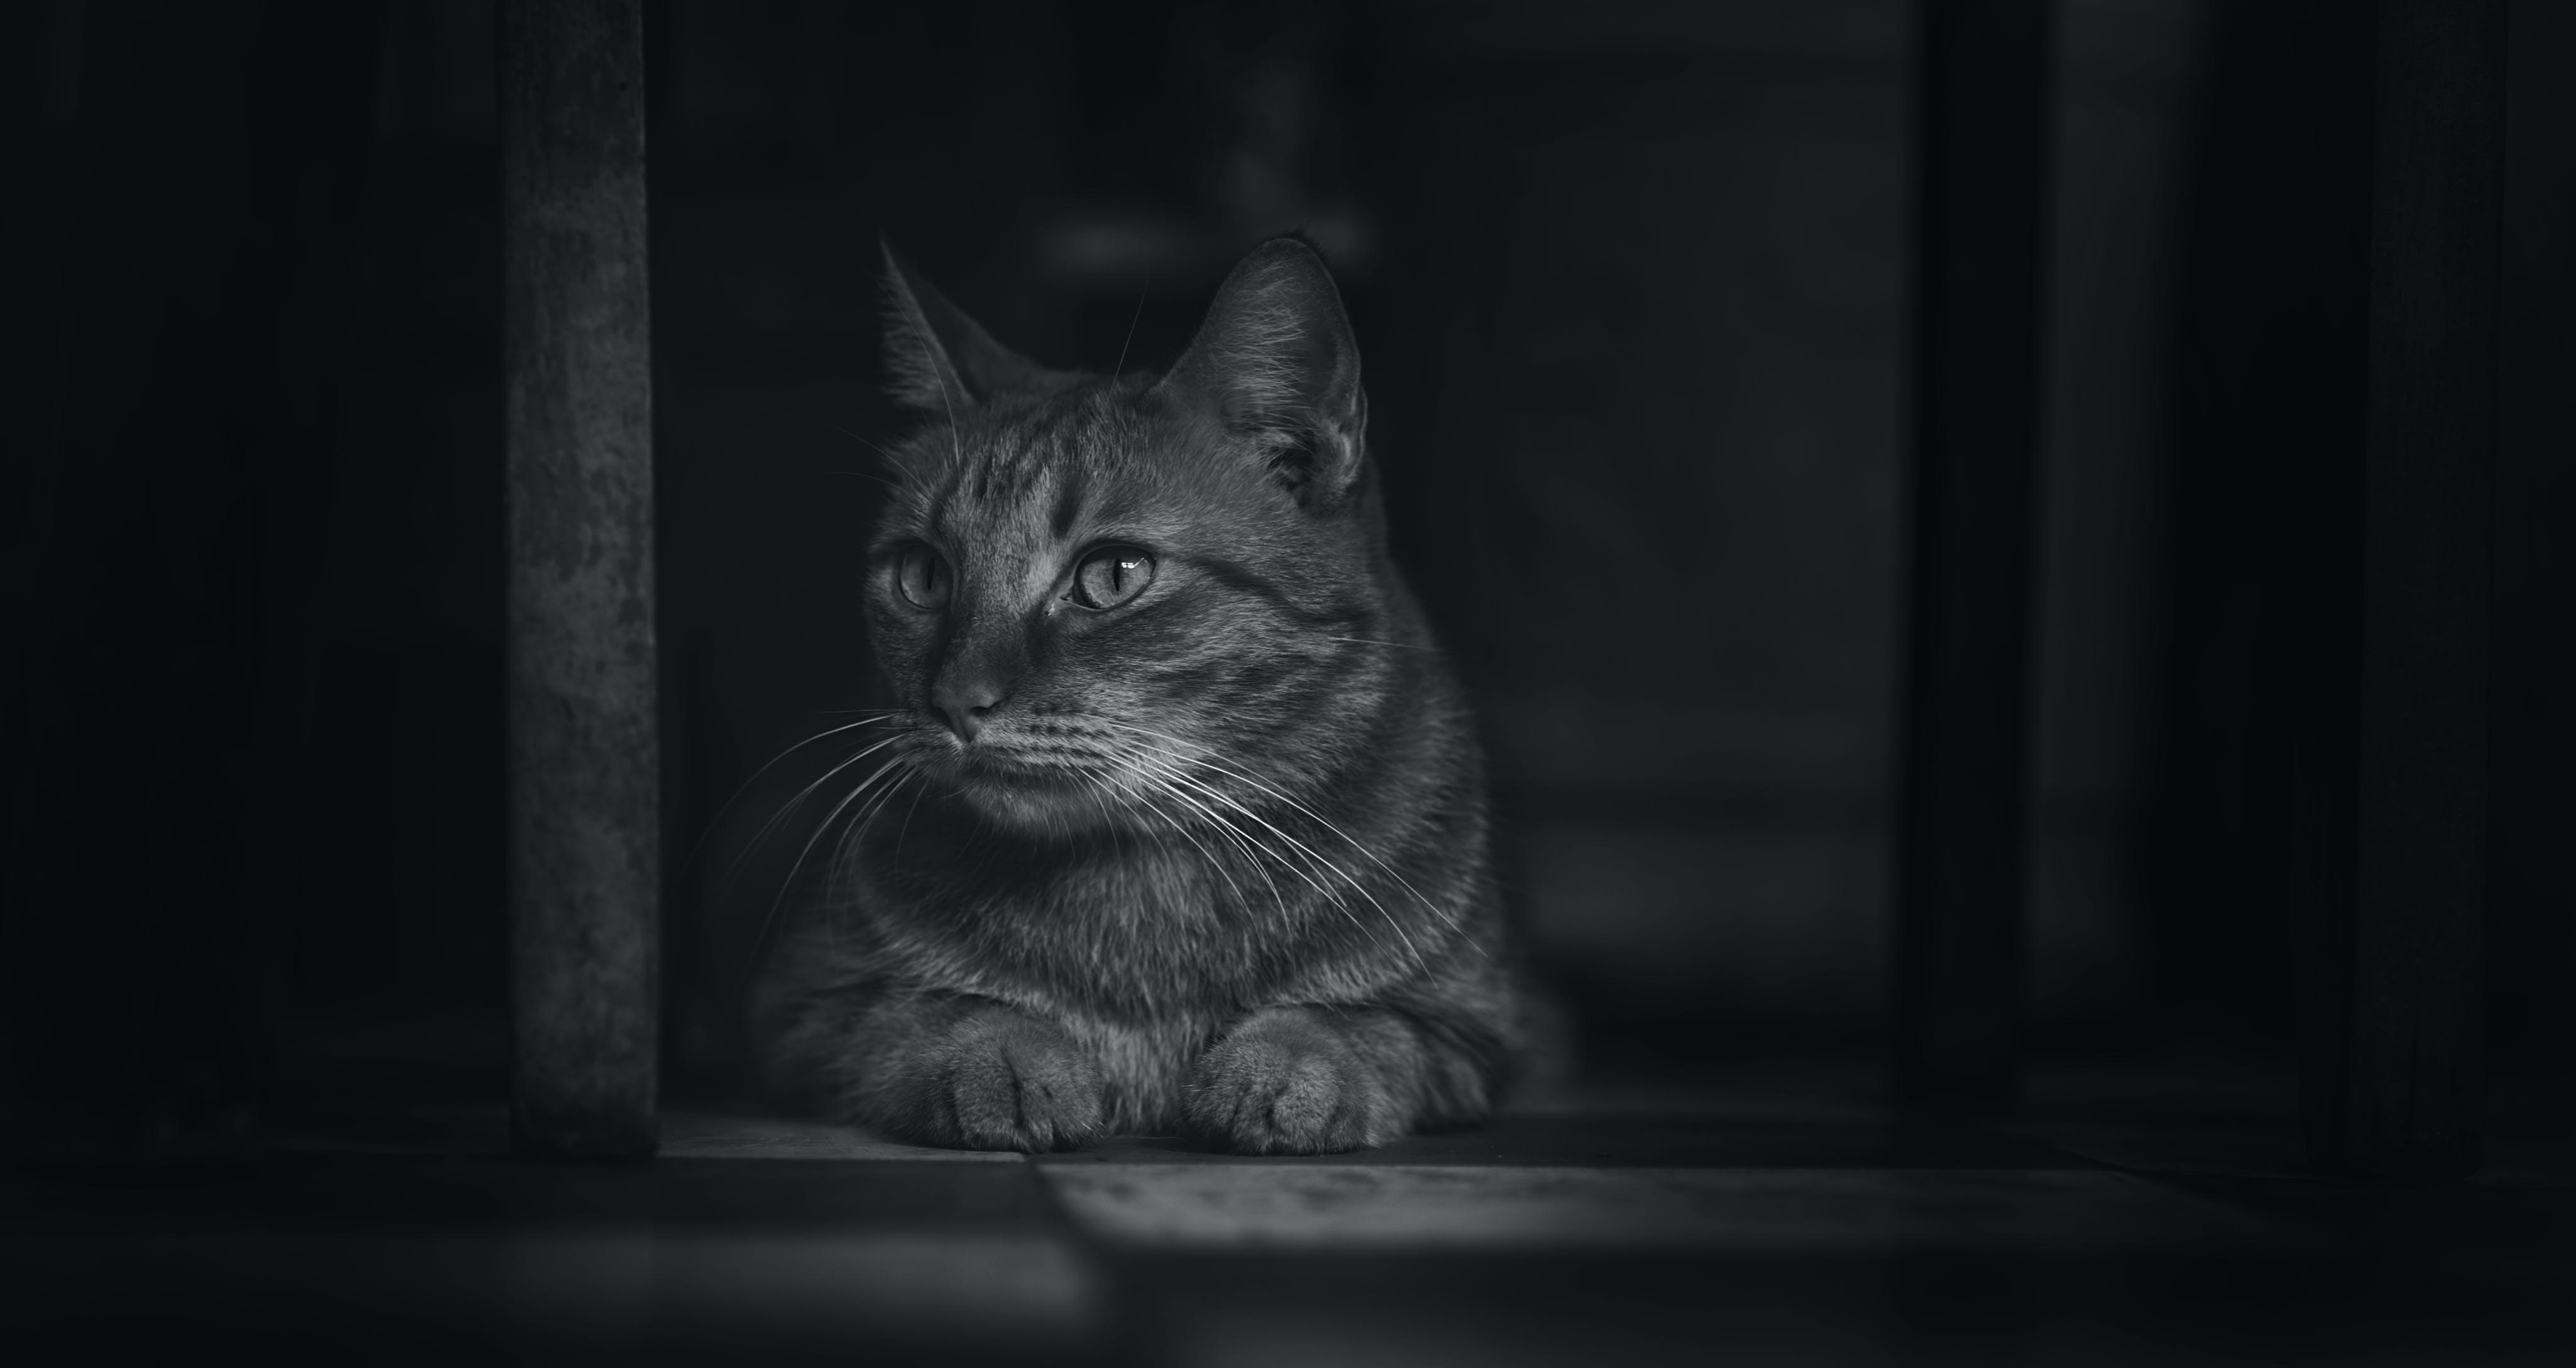 Monochrome Photography of Cat